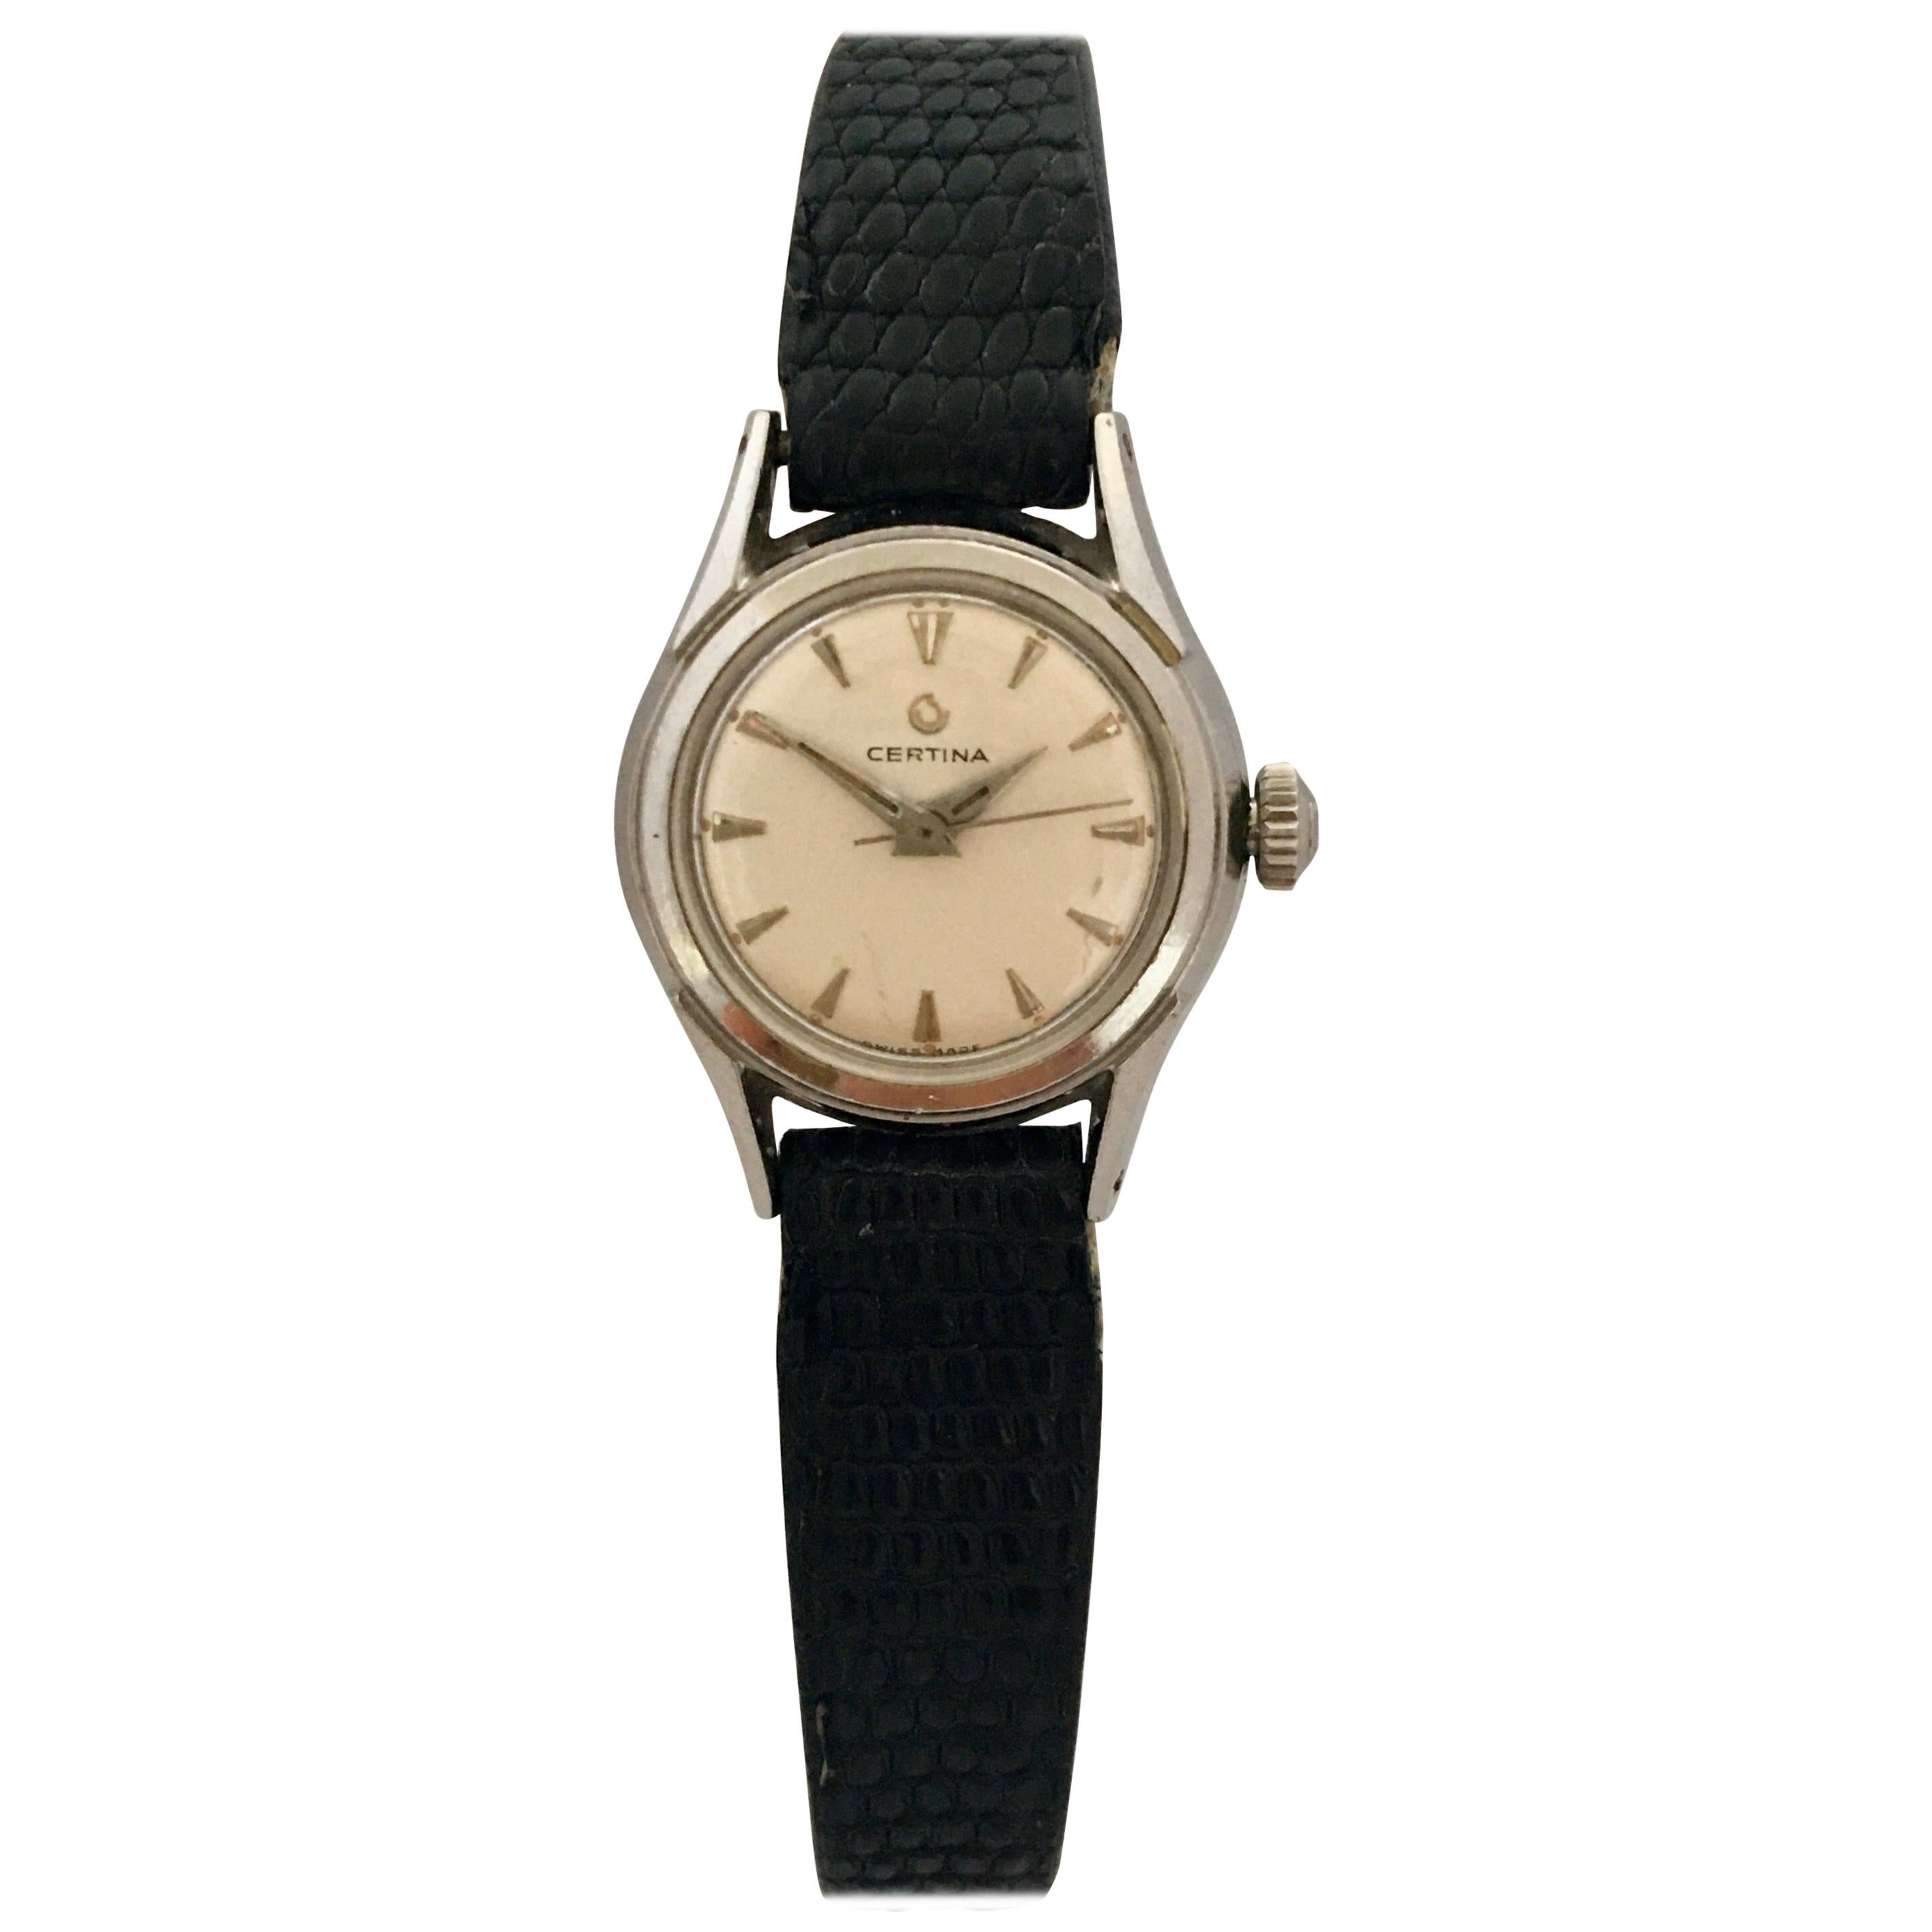 Vintage 1960s Certina Ladies Mechanical Watch